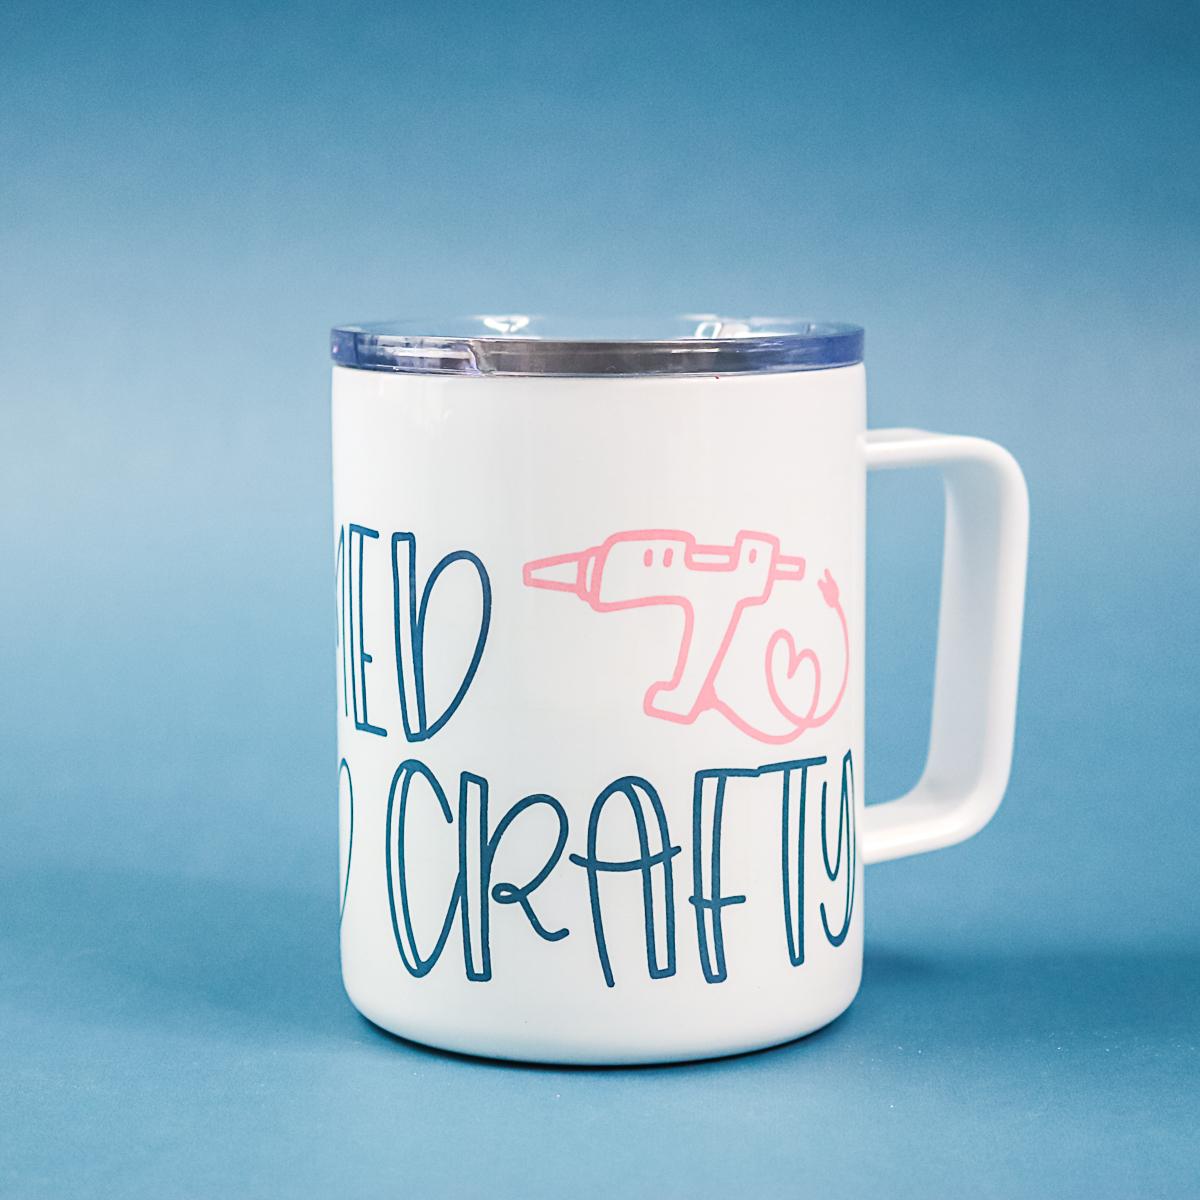 armed and crafty file on a coffee mug